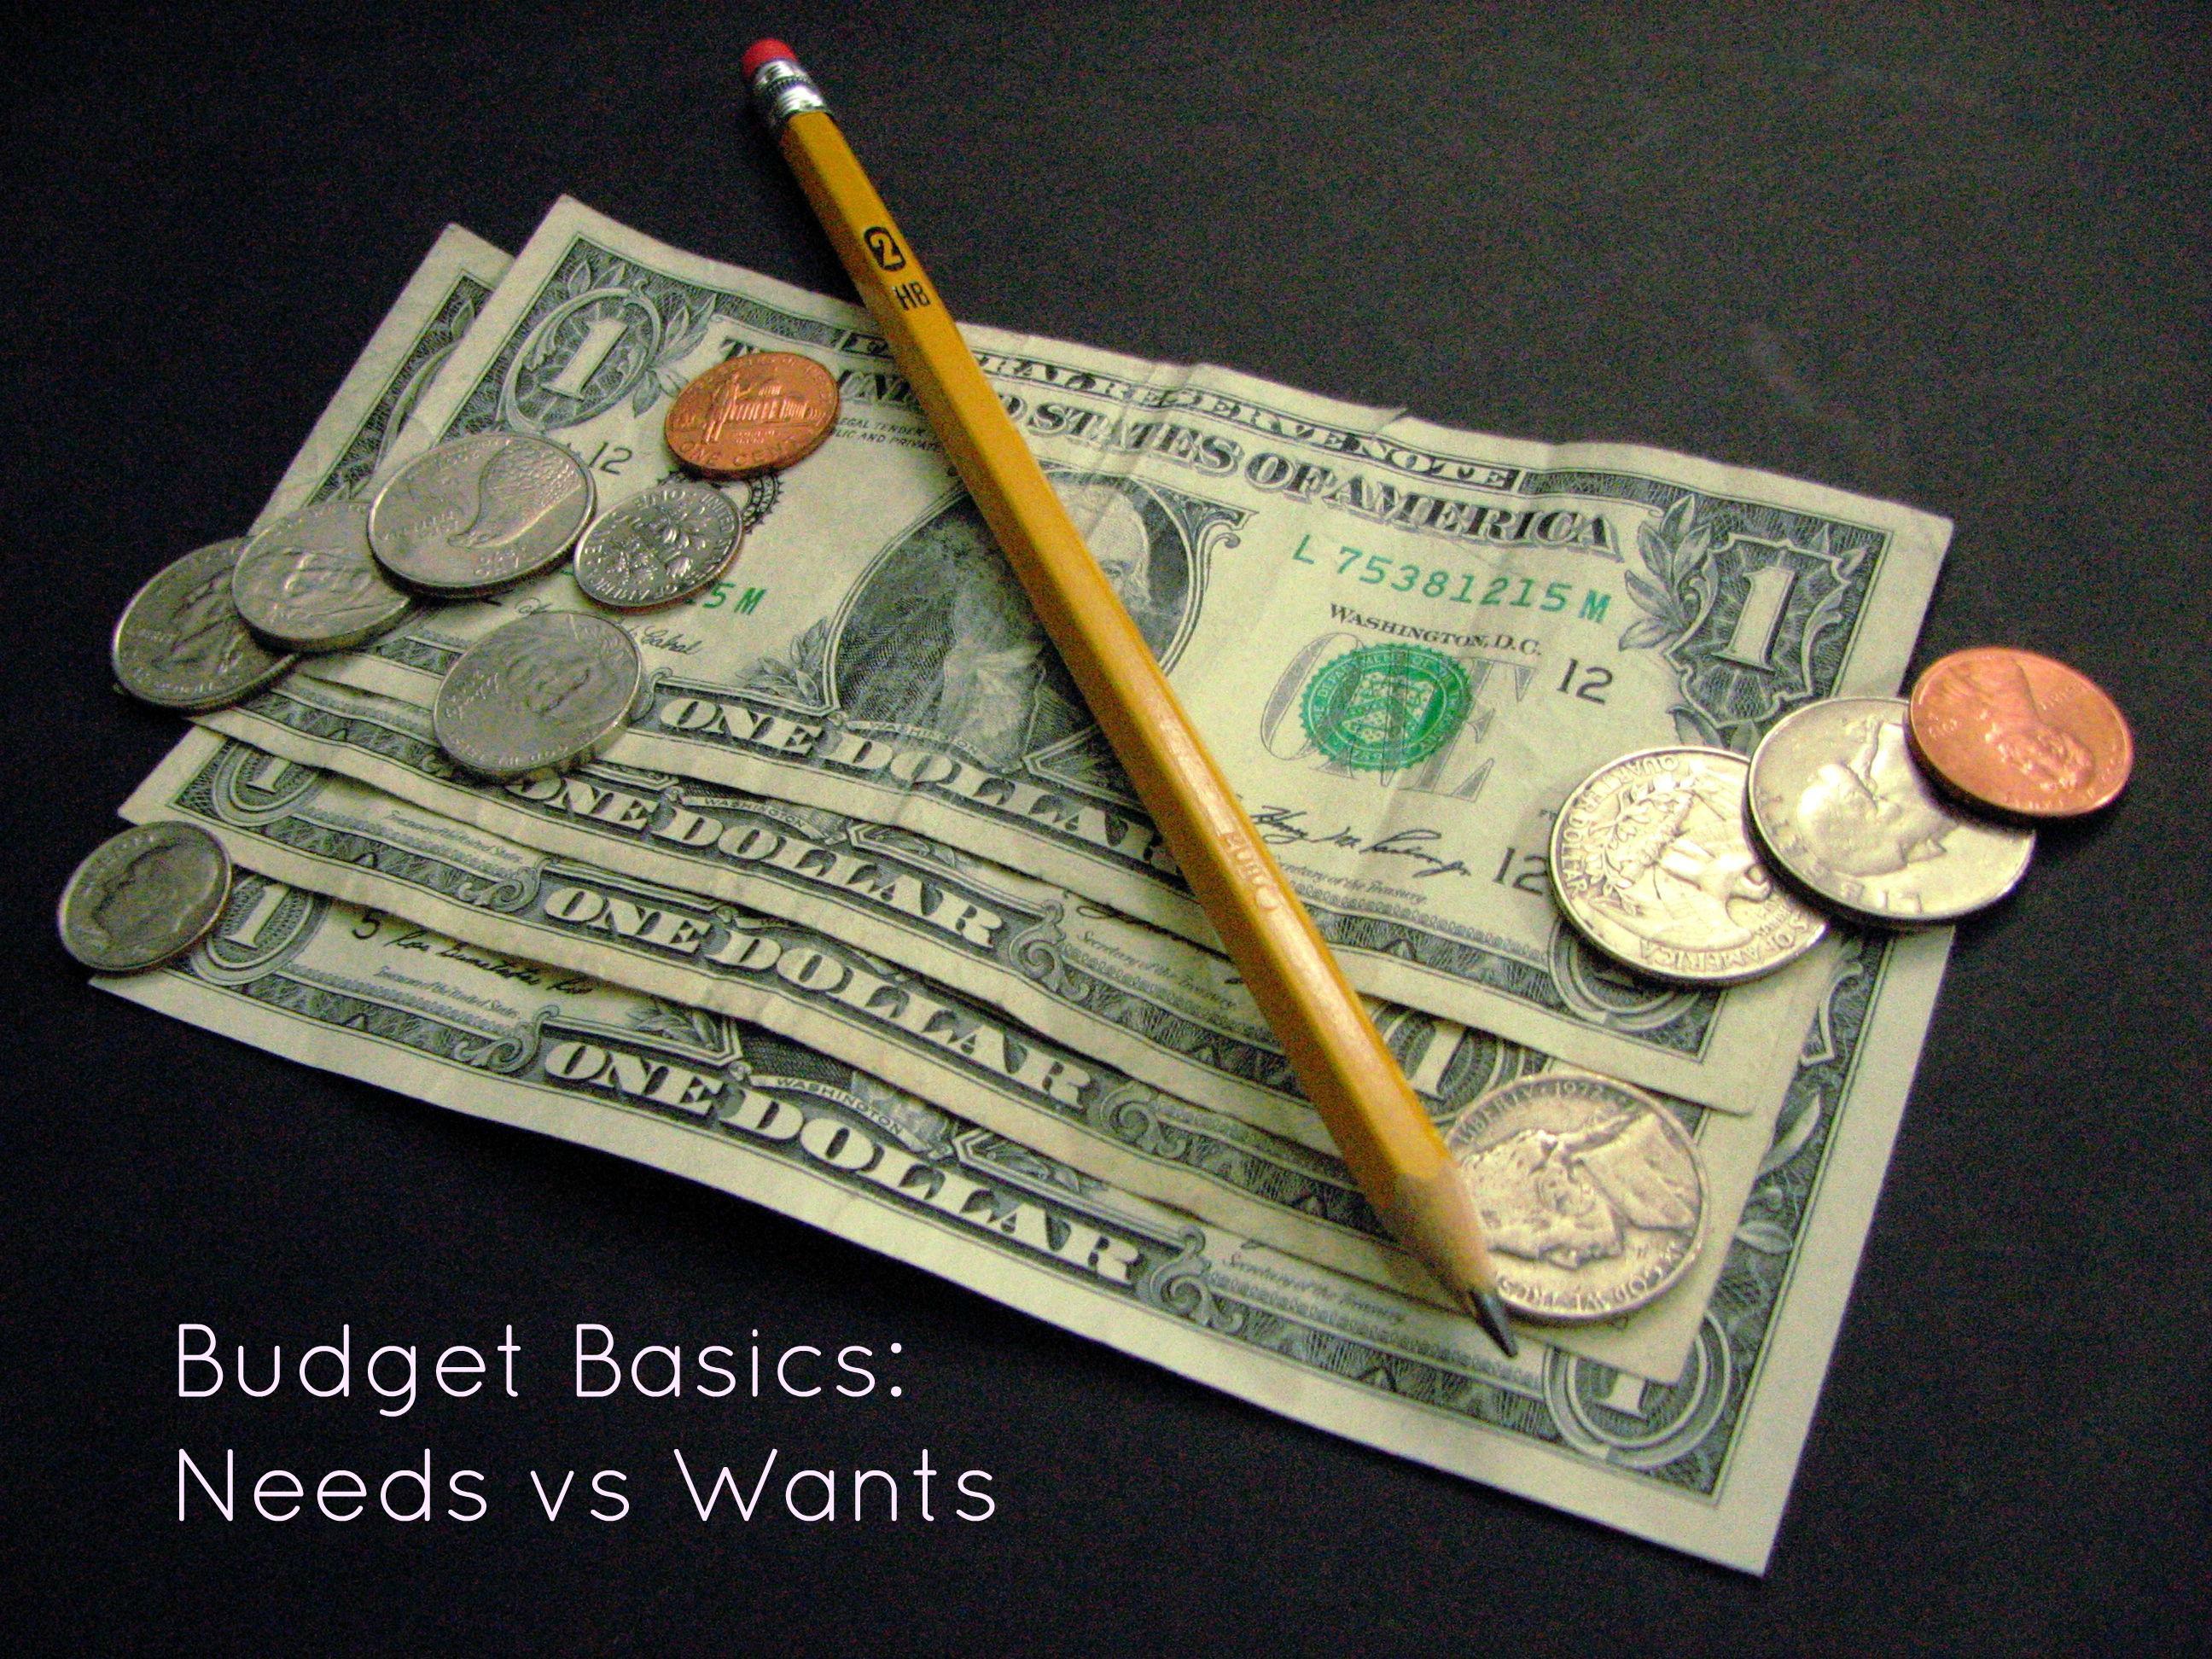 Budget Basics Needs Vs Wants